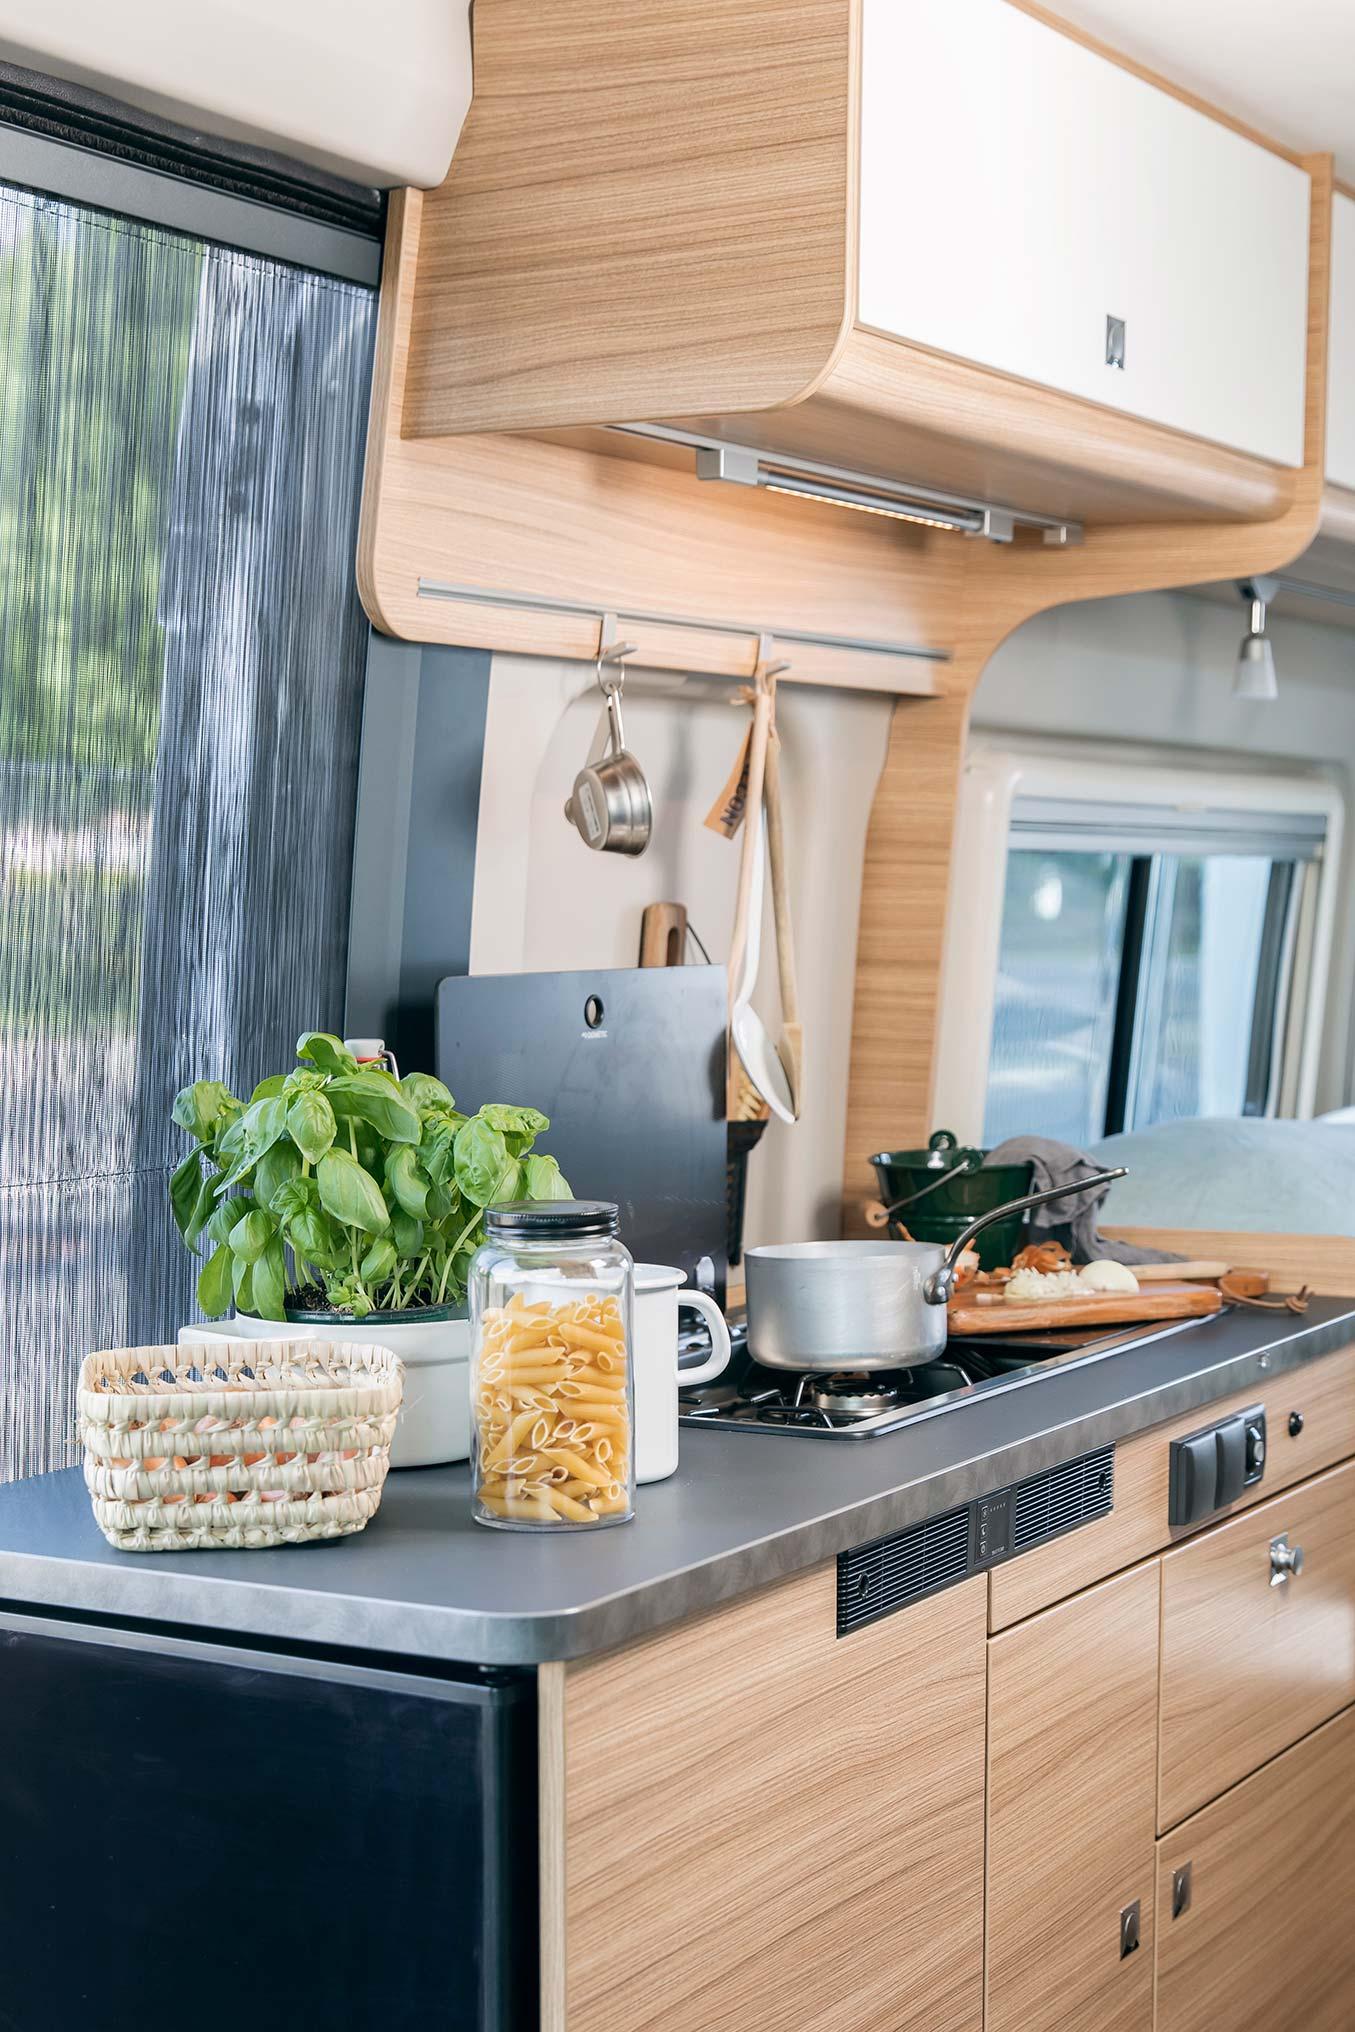 Sunlight Cliff keuken - Sunlight motorhome kopen